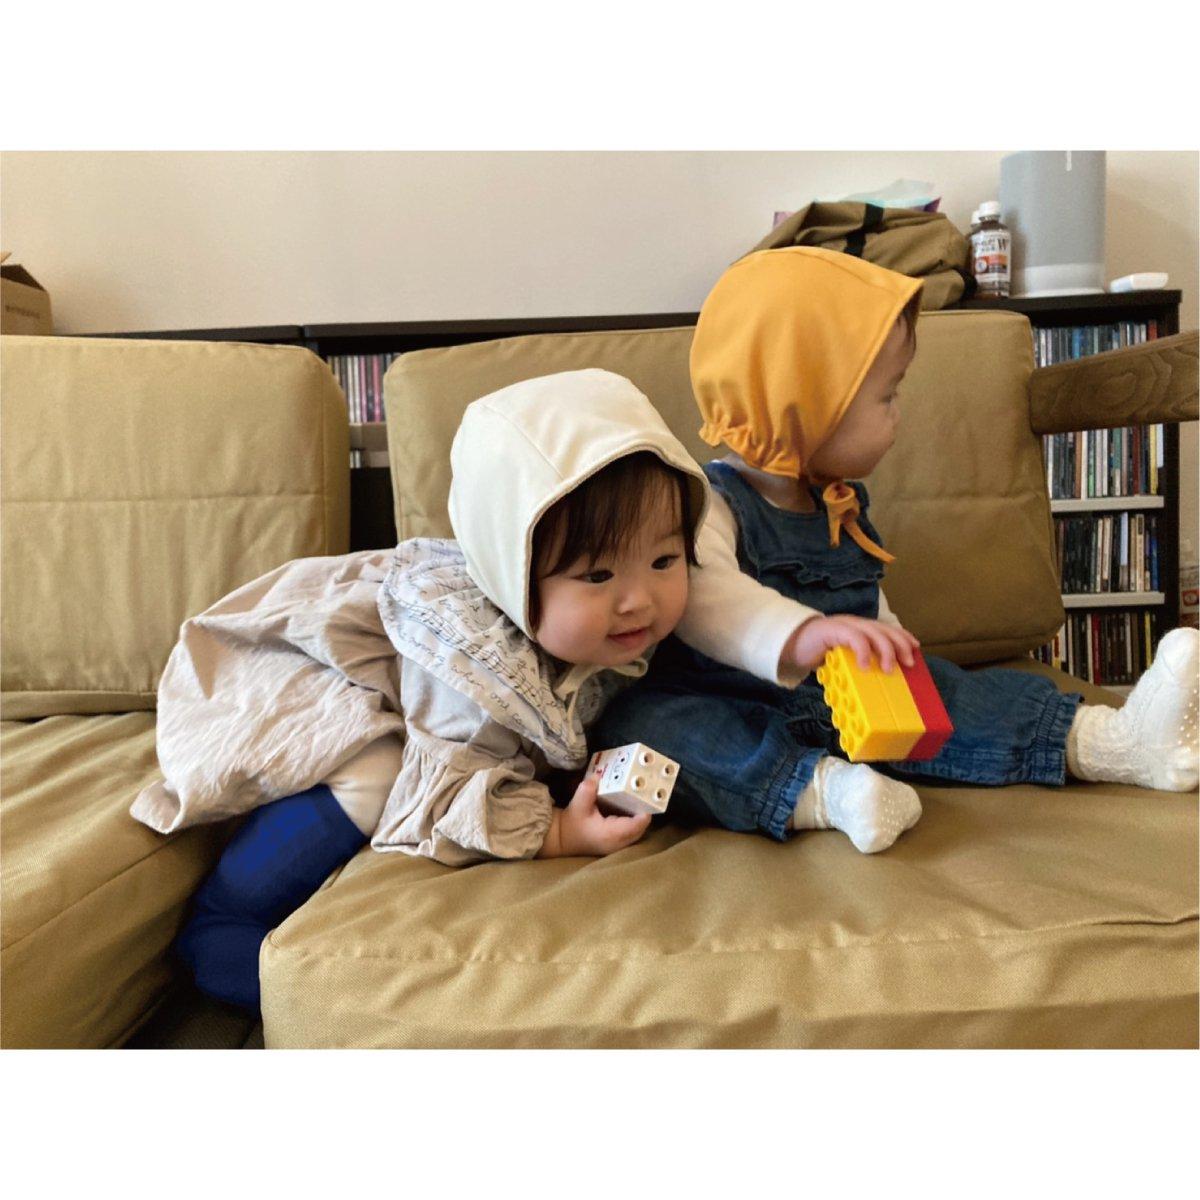 【BABY】Candy Bonnet 詳細画像20